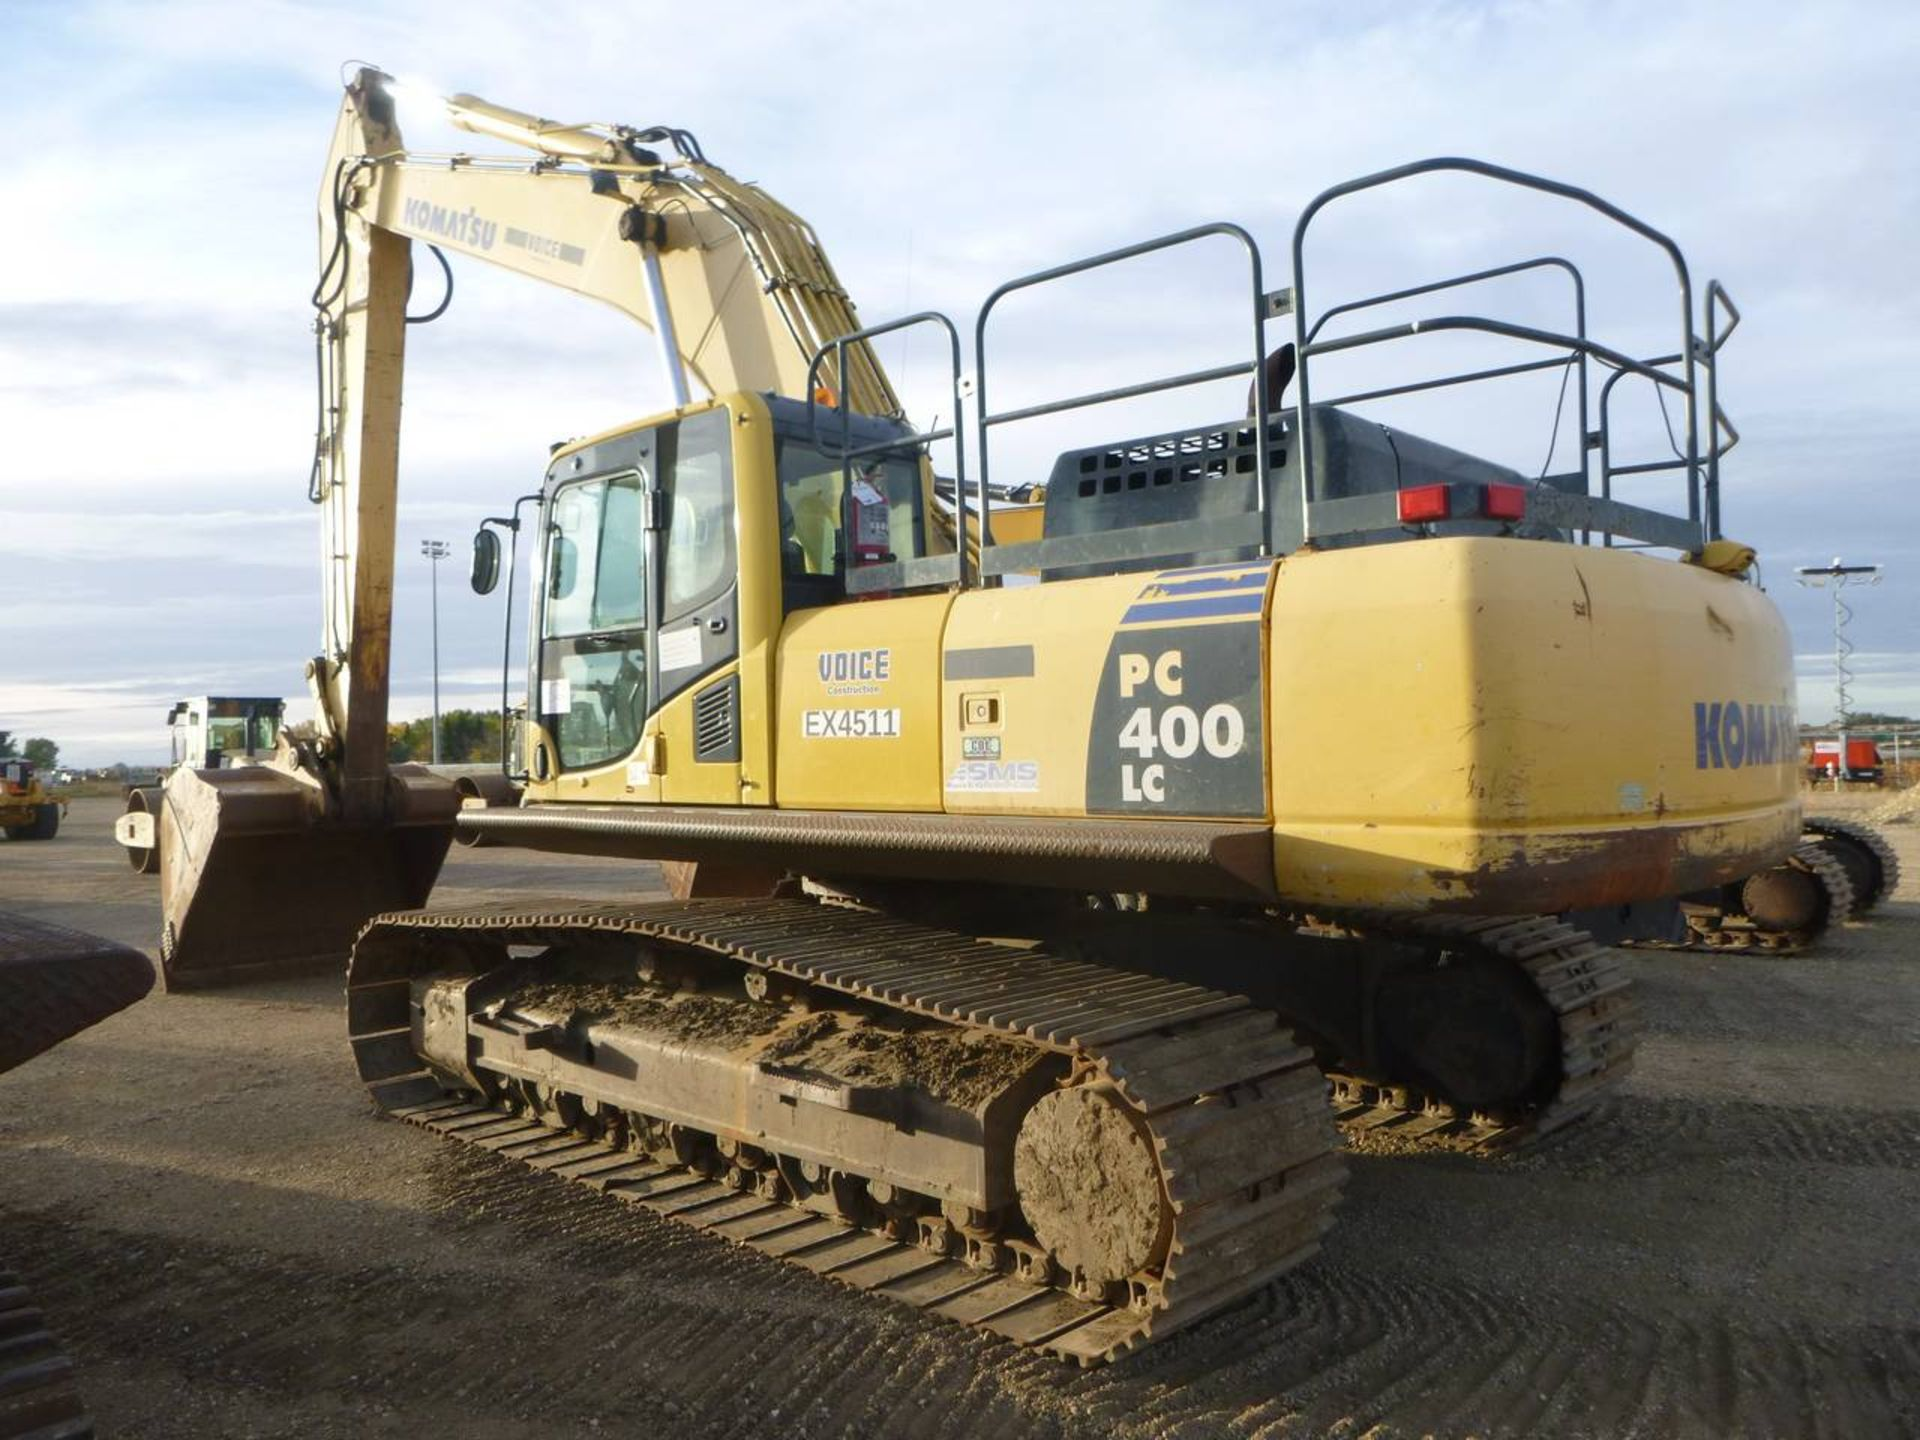 2008 Komatsu PC400LC-8 Excavator - Image 7 of 13